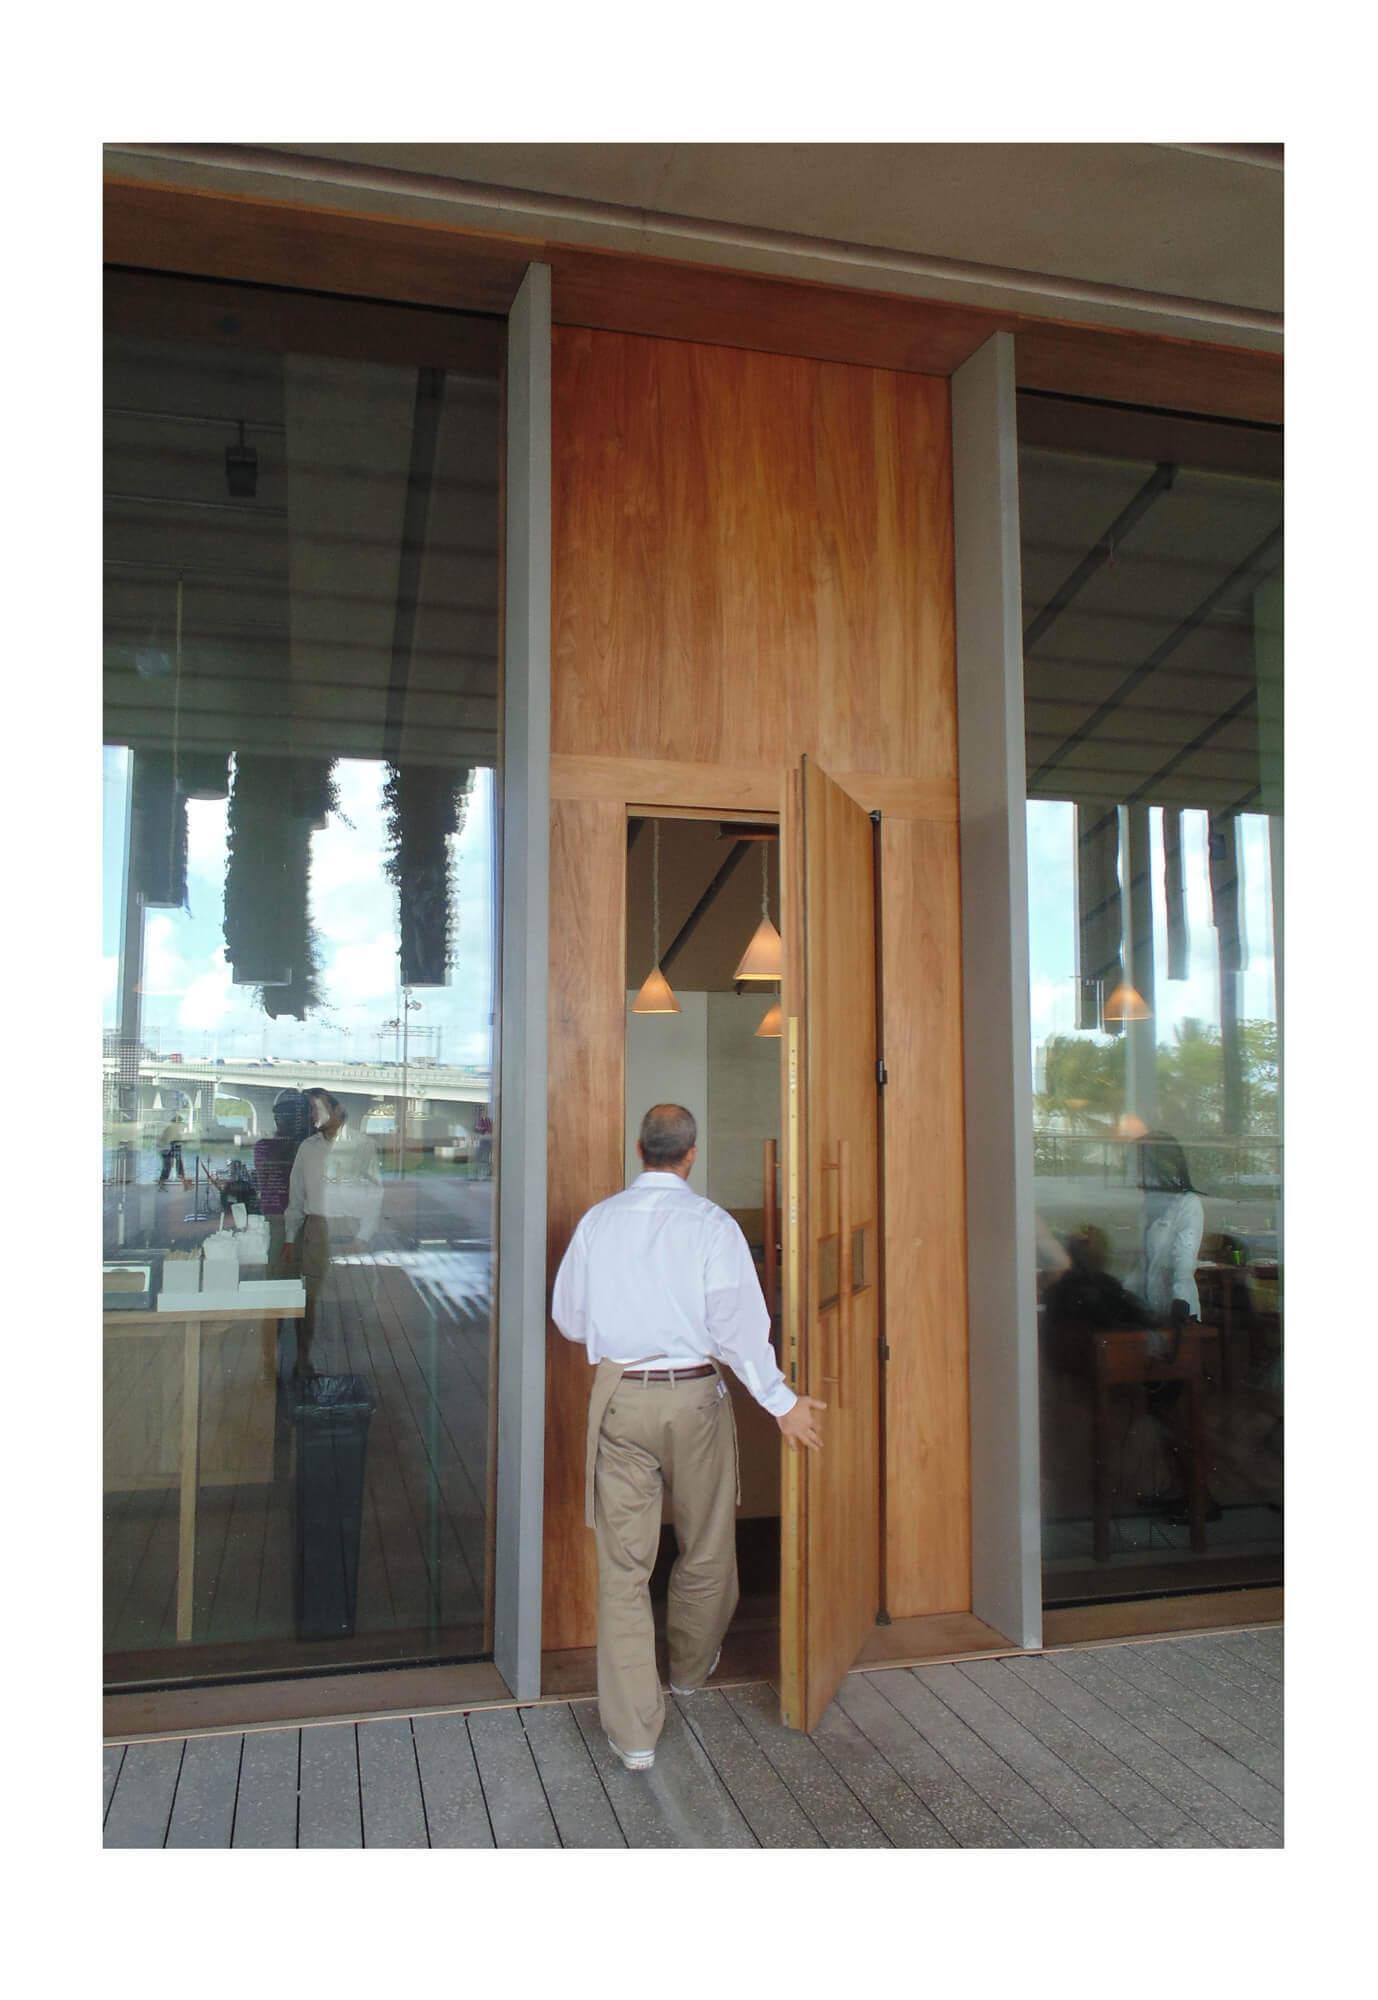 TEAK ENTRY DOOR TO RESTAURANT OF THE MIAMI PEREZ ART MUSEUM.